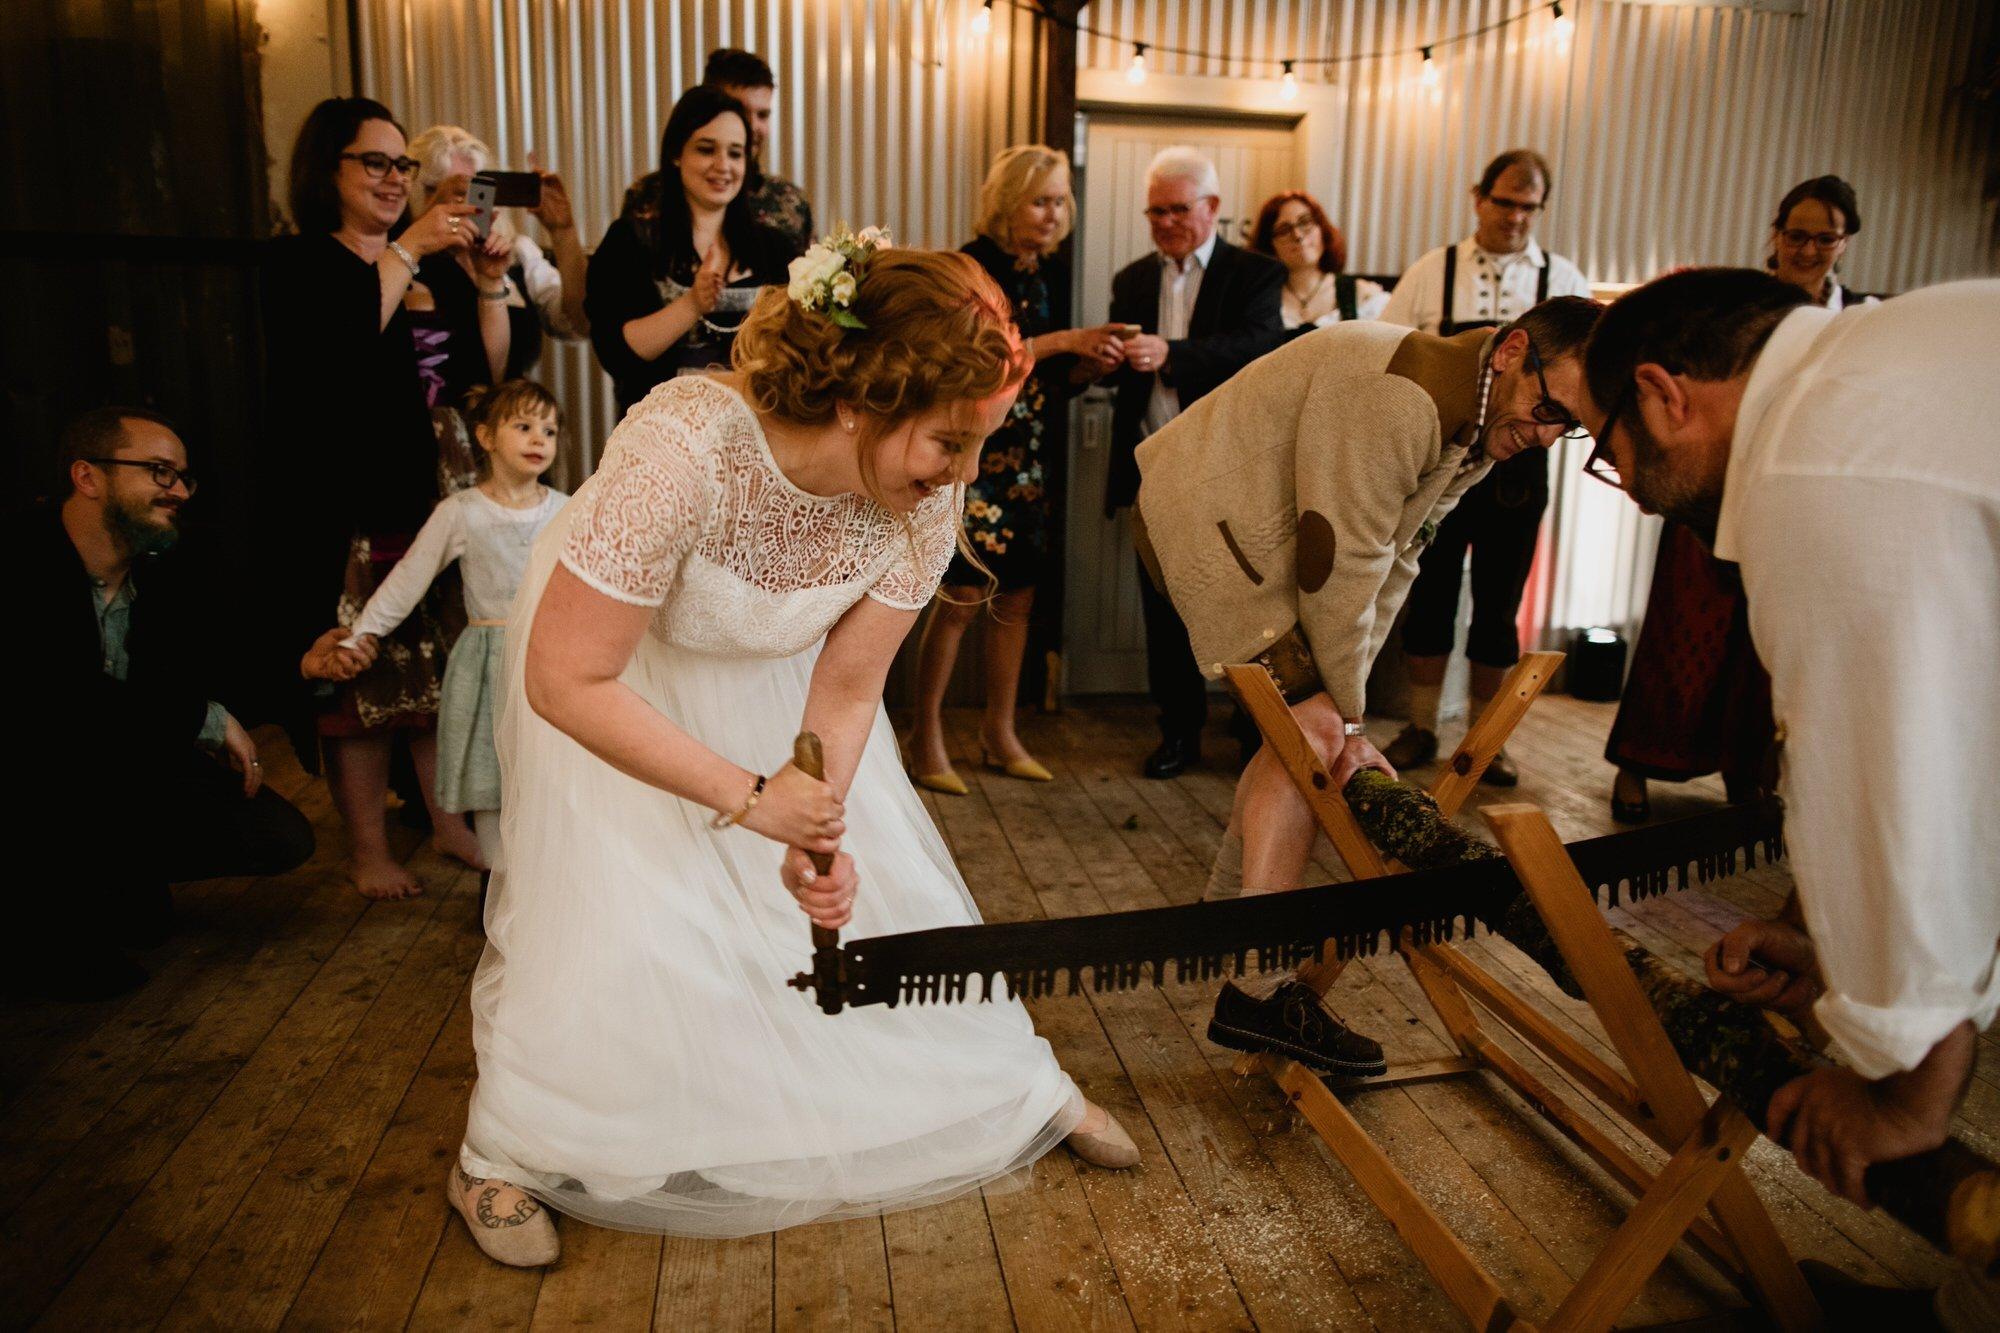 056 TIN SHED KNOCKRAICH WEDDING AUSTRIAN SCOTTISH ZOE ALEXANDRA PHOTOGRAPHY